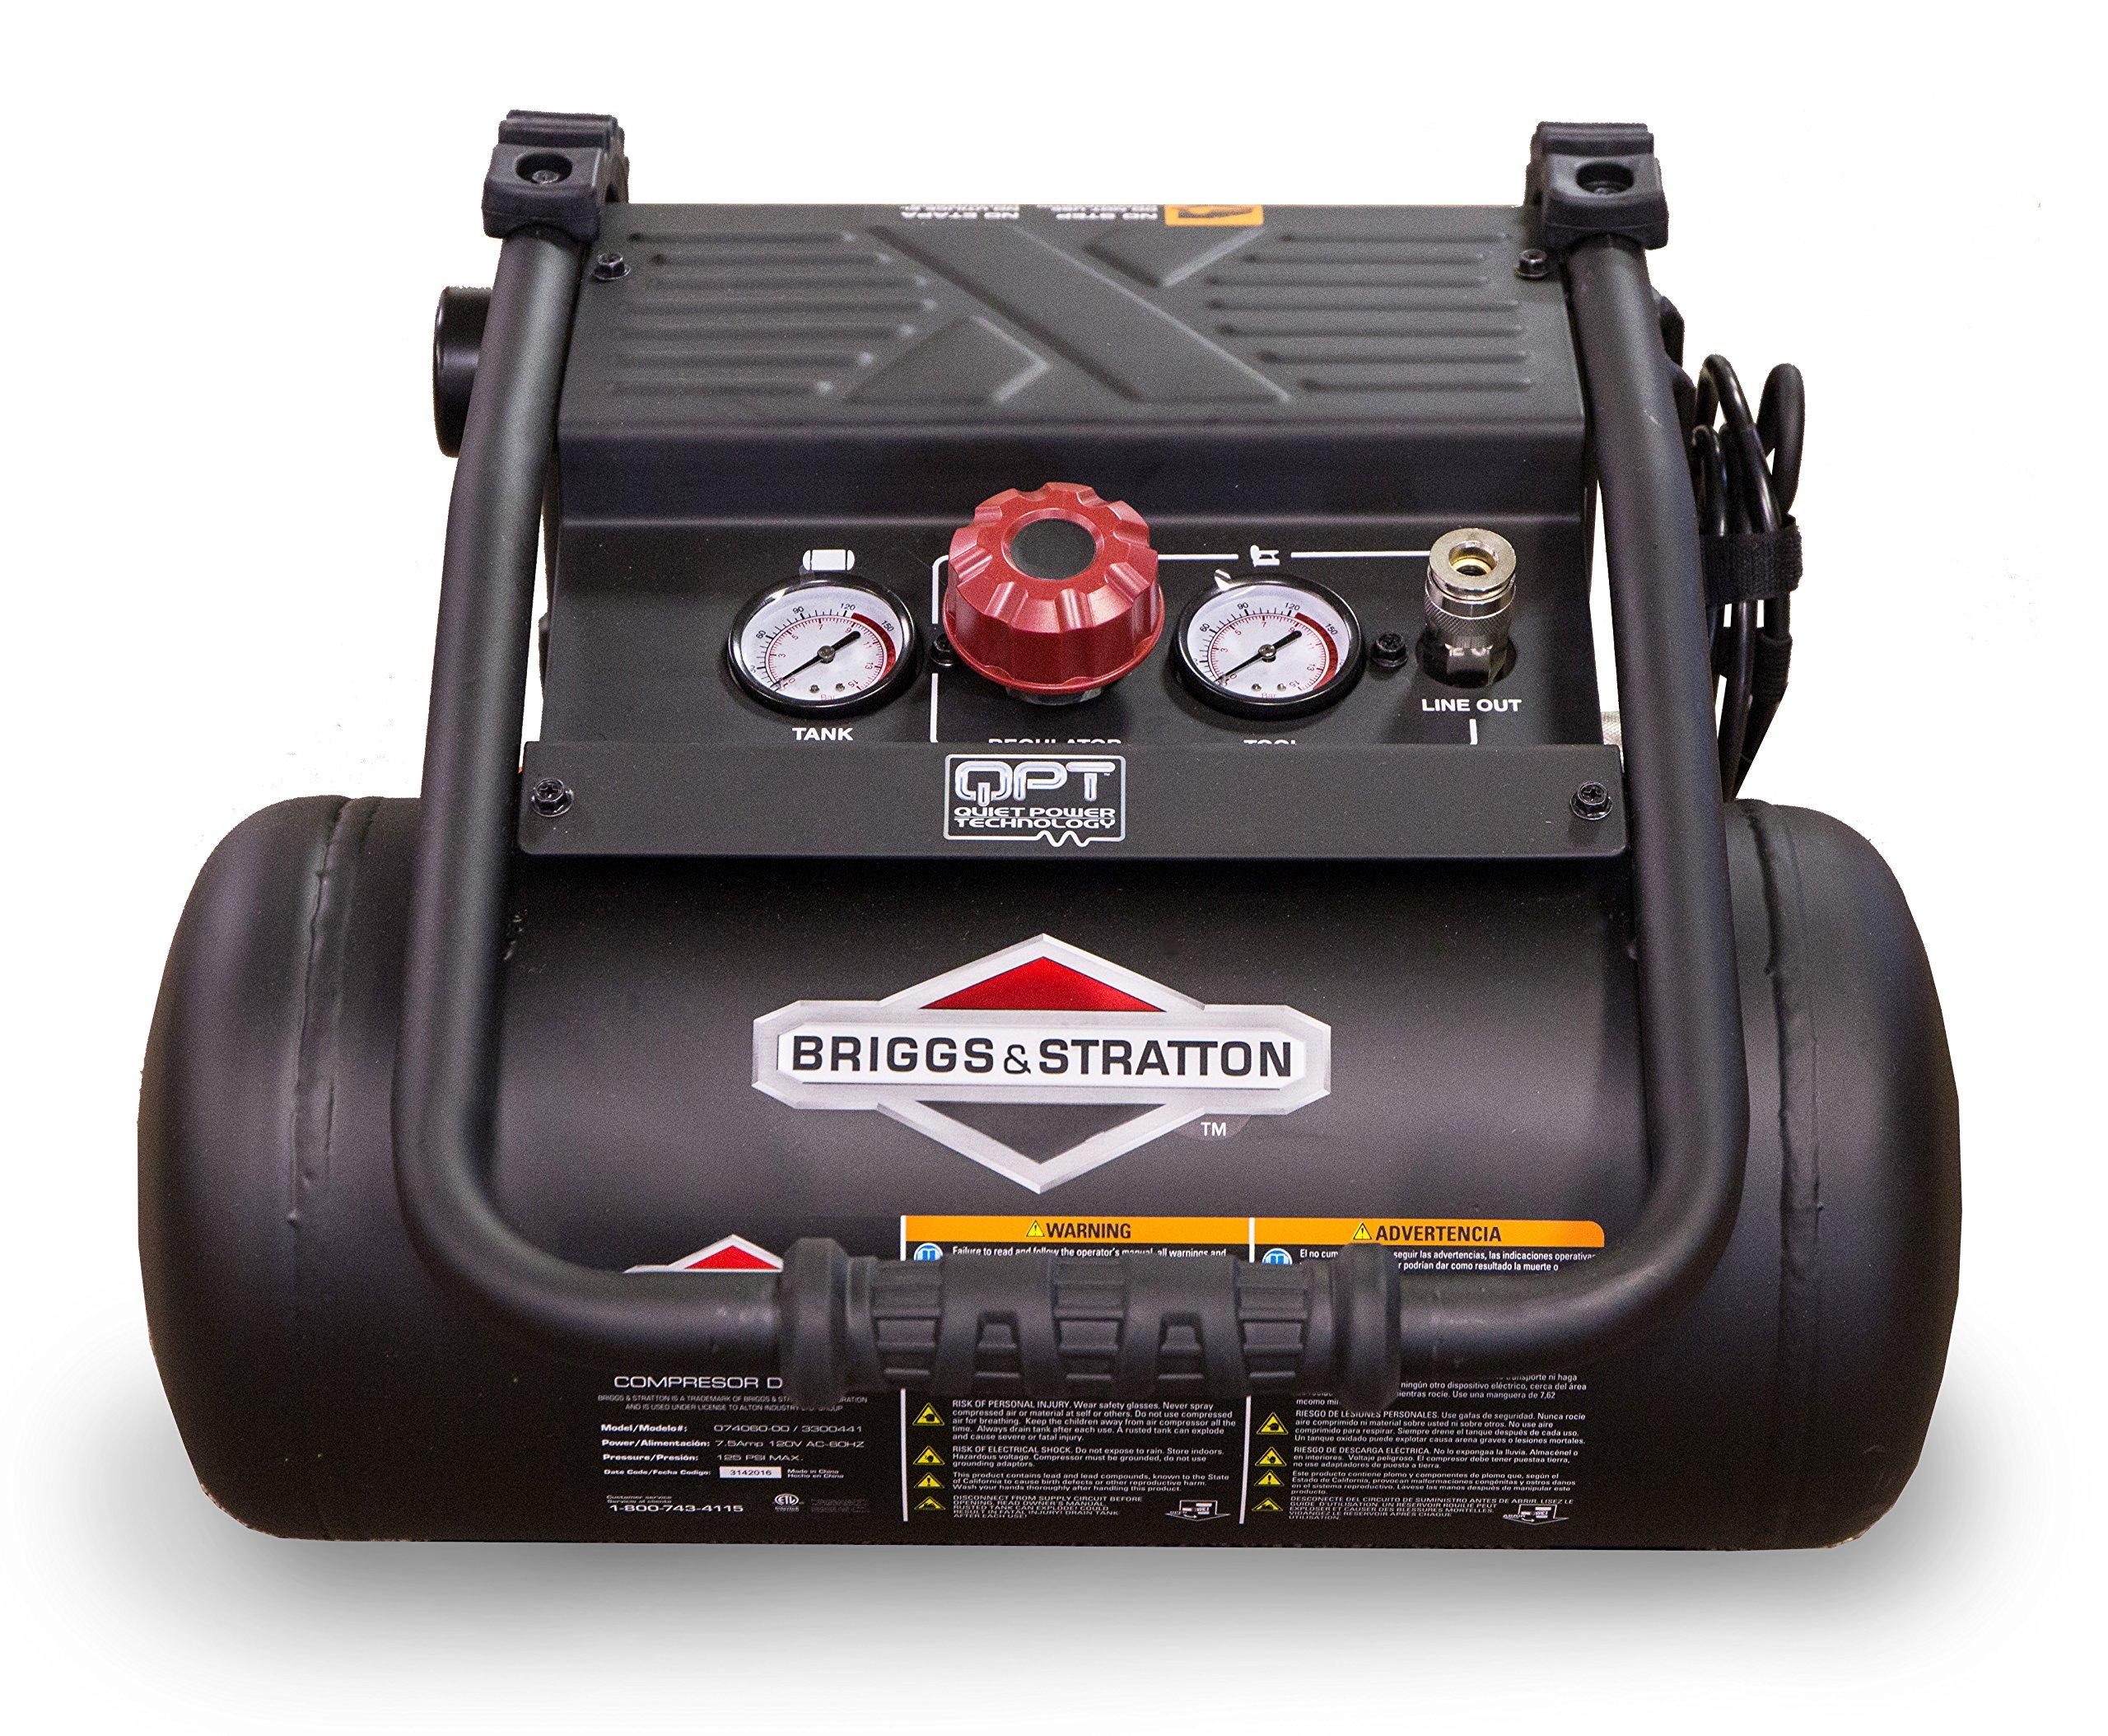 Briggs & Stratton 4-Gallon Quiet Power Technology Air Compressor 074060-00 by Briggs & Stratton